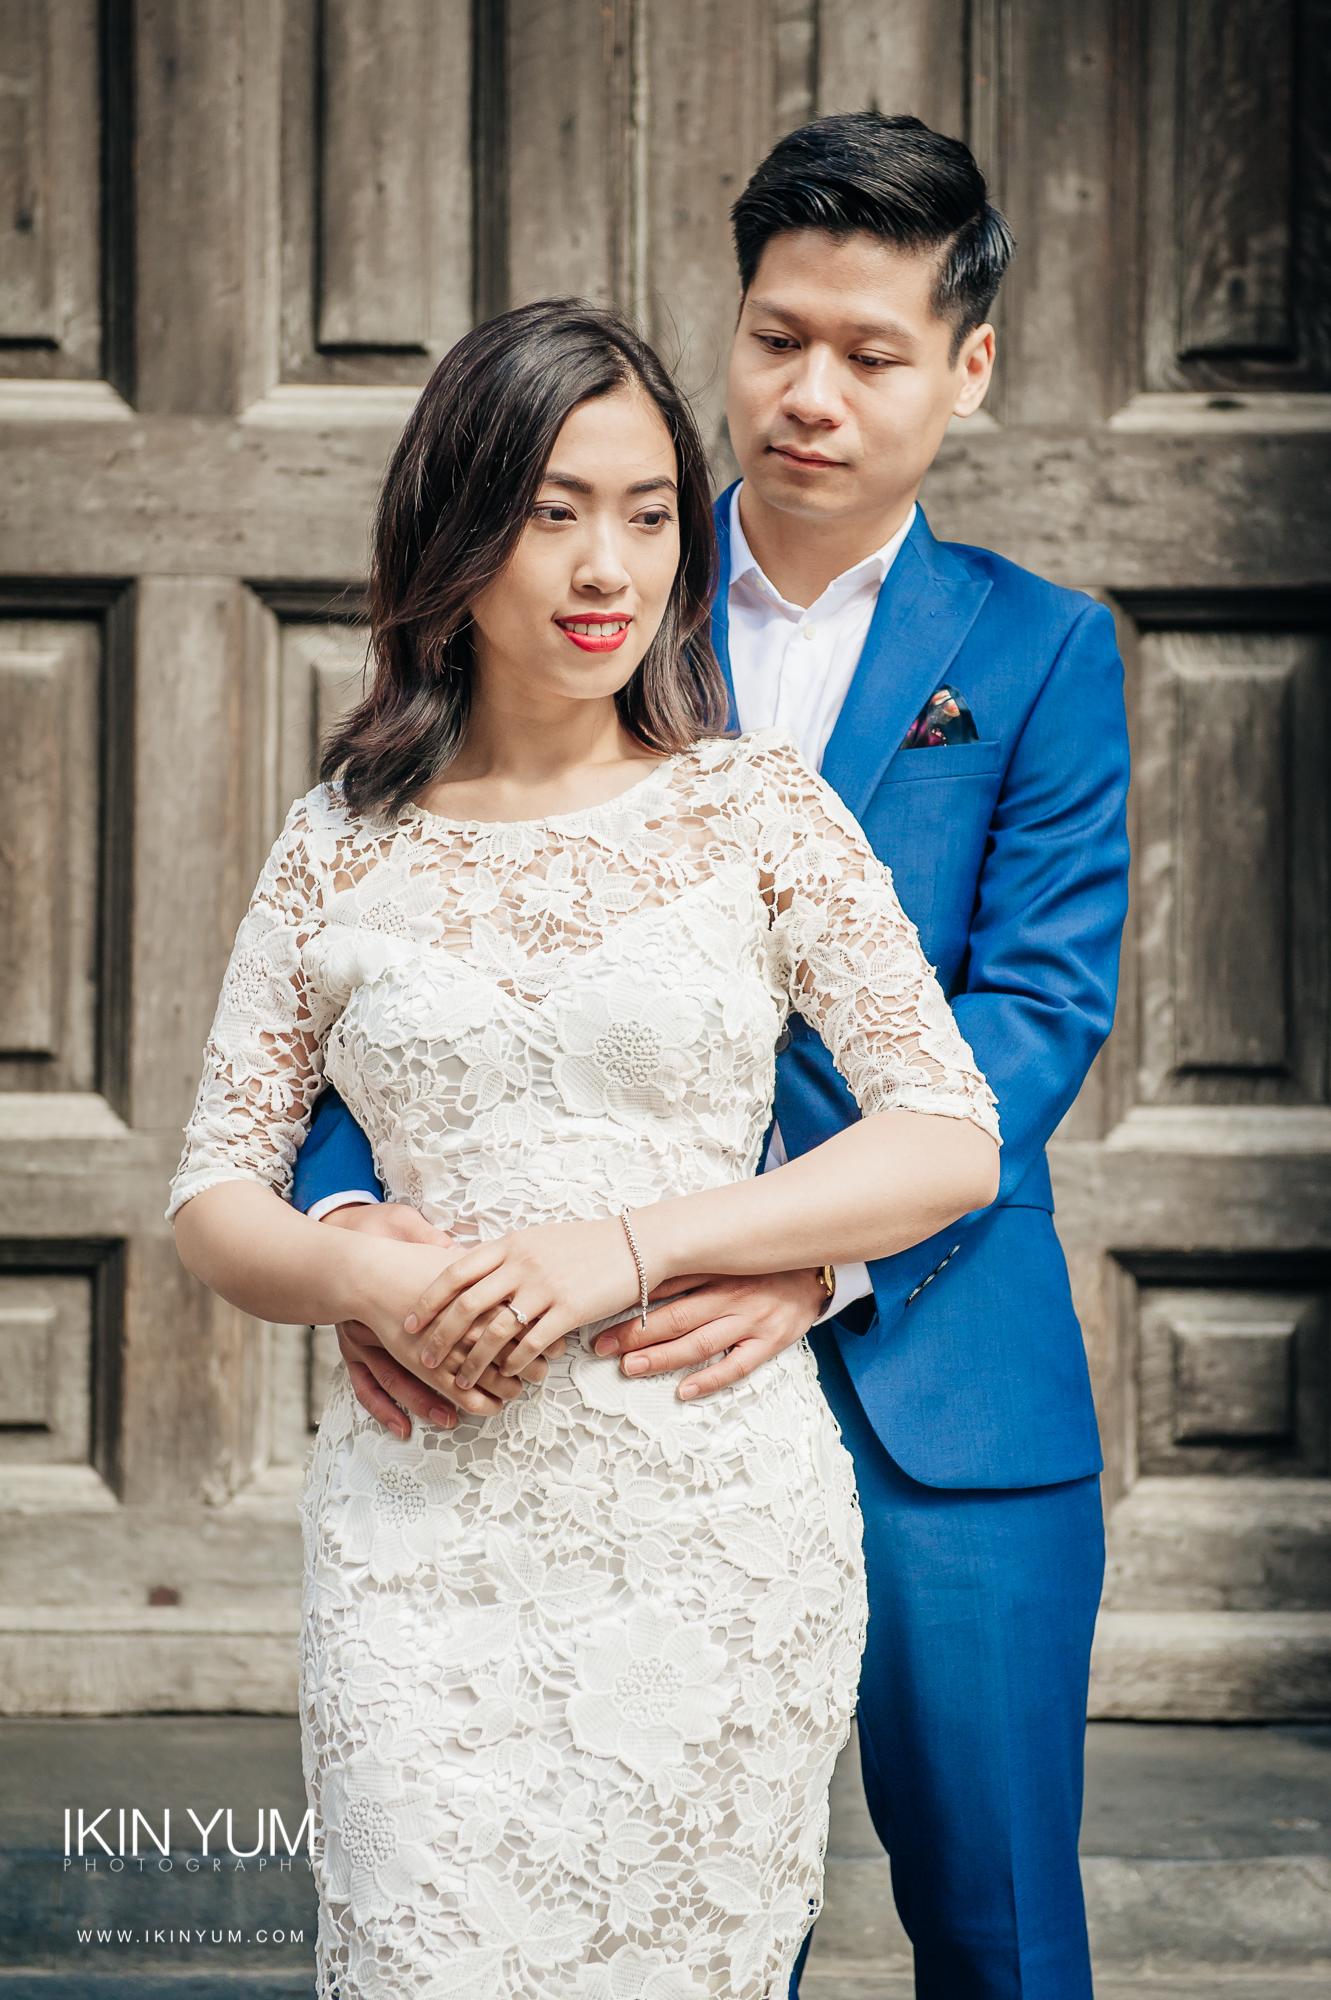 Natalie & Duncan Wedding Day - Ikin Yum Photography-100.jpg